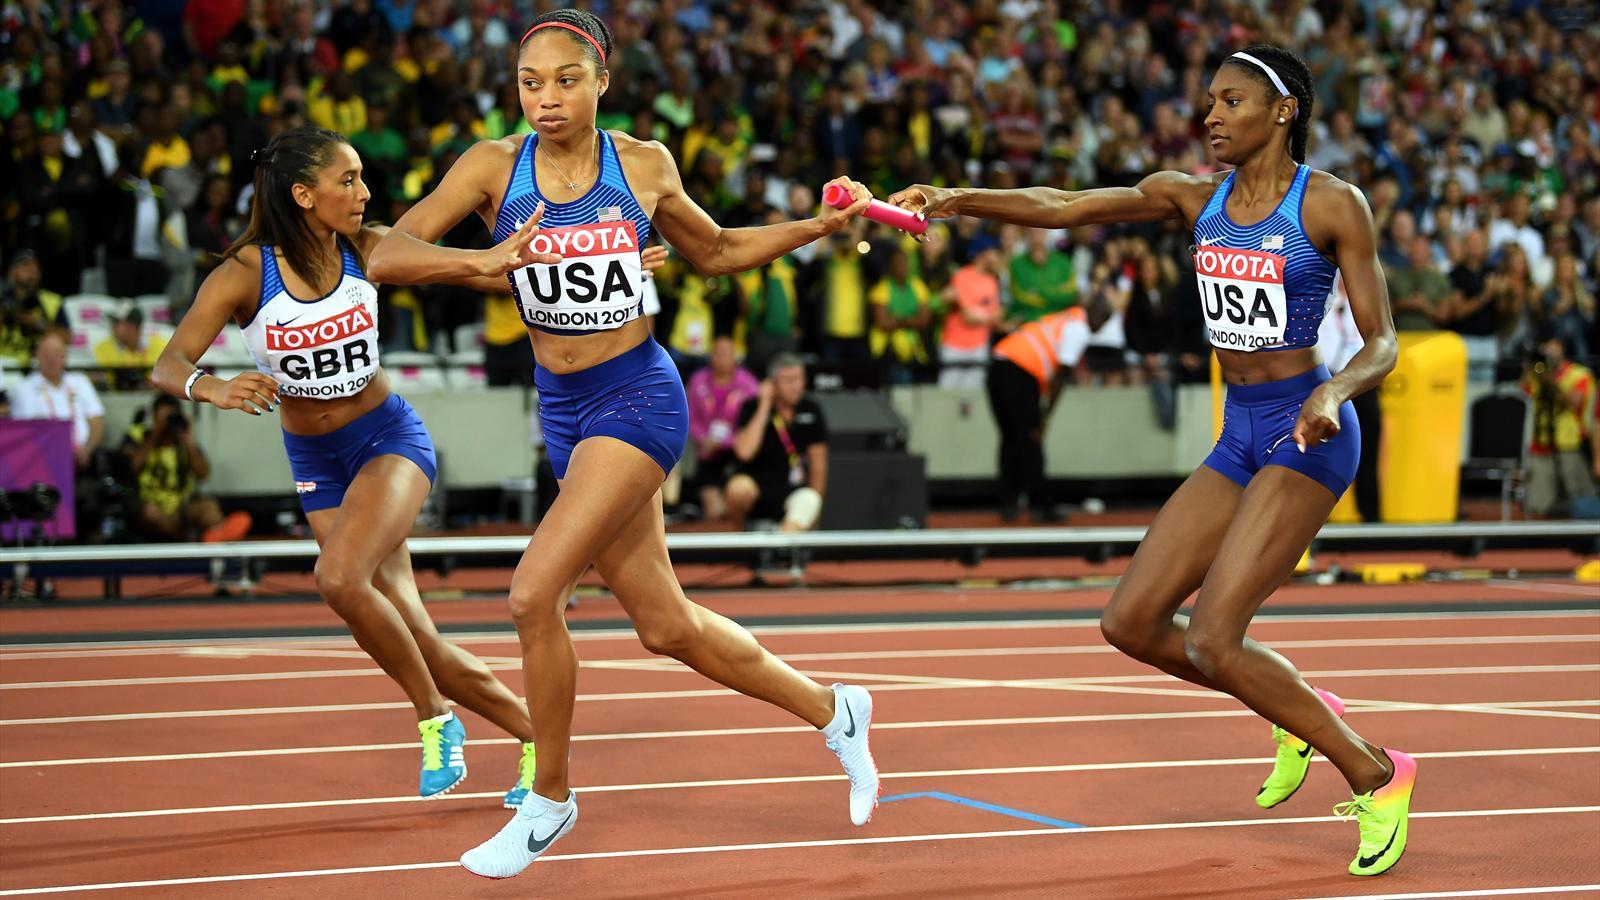 World Athletics 2017: USA reclaim 4x400m title and GB take silver as Jamaica suffer more injury woe - World Championships 2017 - Athletics - Eurosport